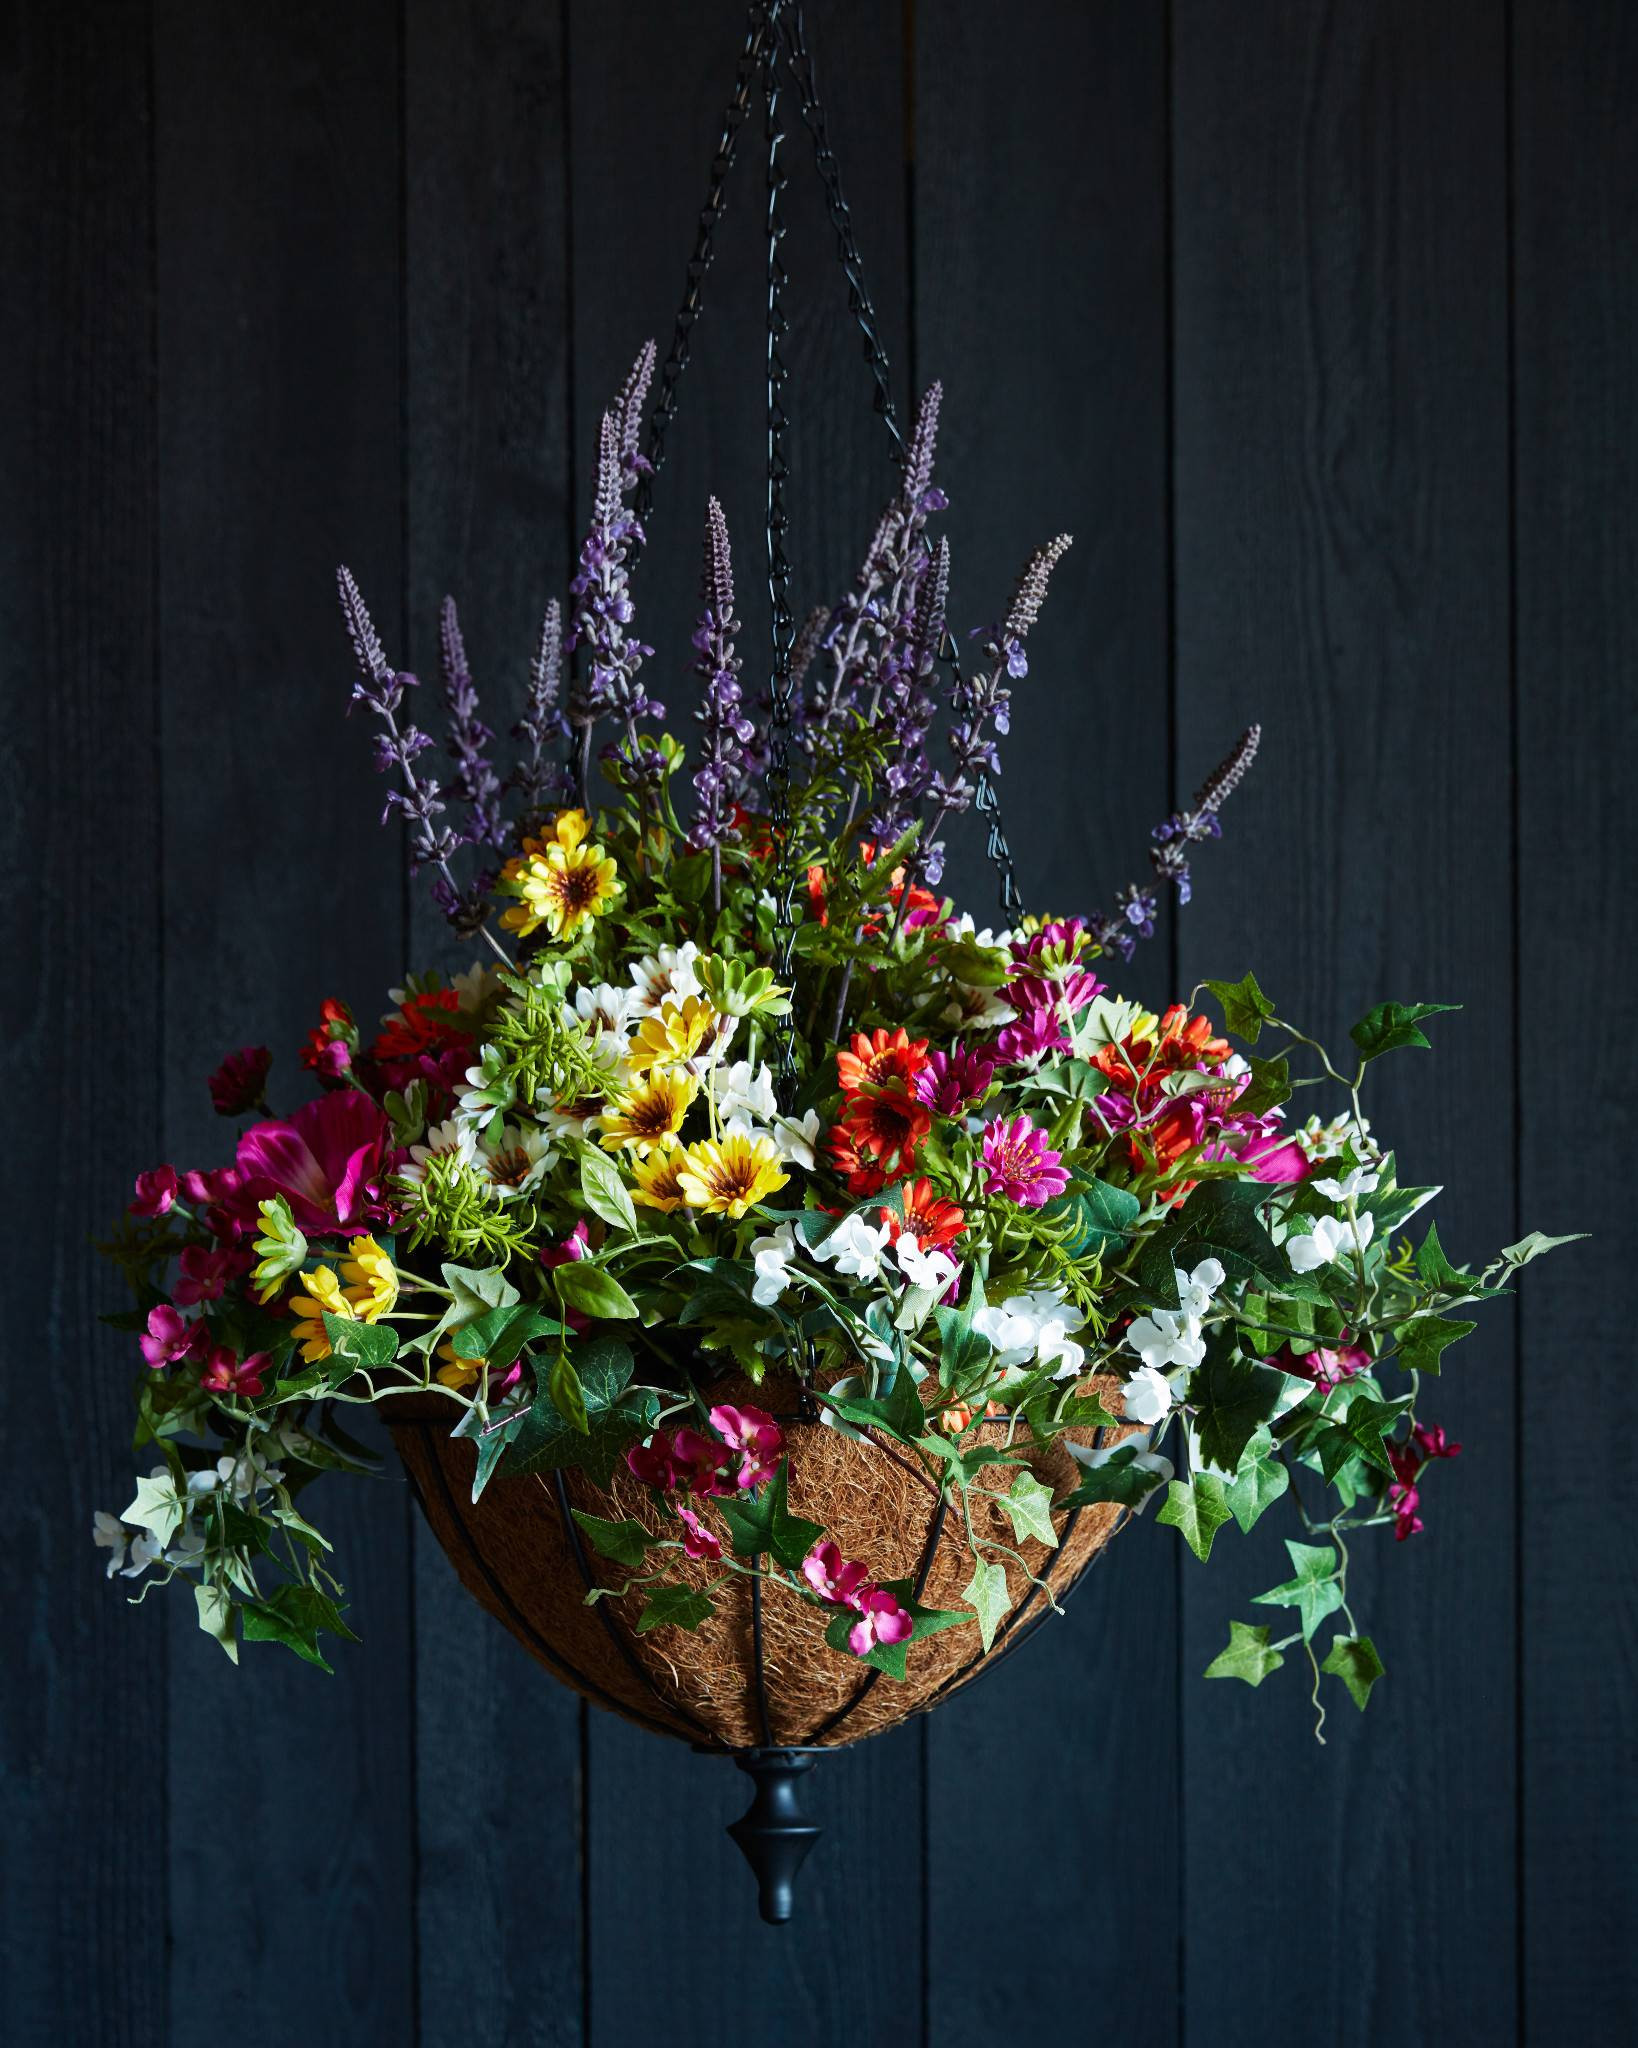 13 Stunning Traditional Dutch Tulip Vases 2021 free download traditional dutch tulip vases of outdoor meadow foliage balsam hill regarding outdoor safe florals